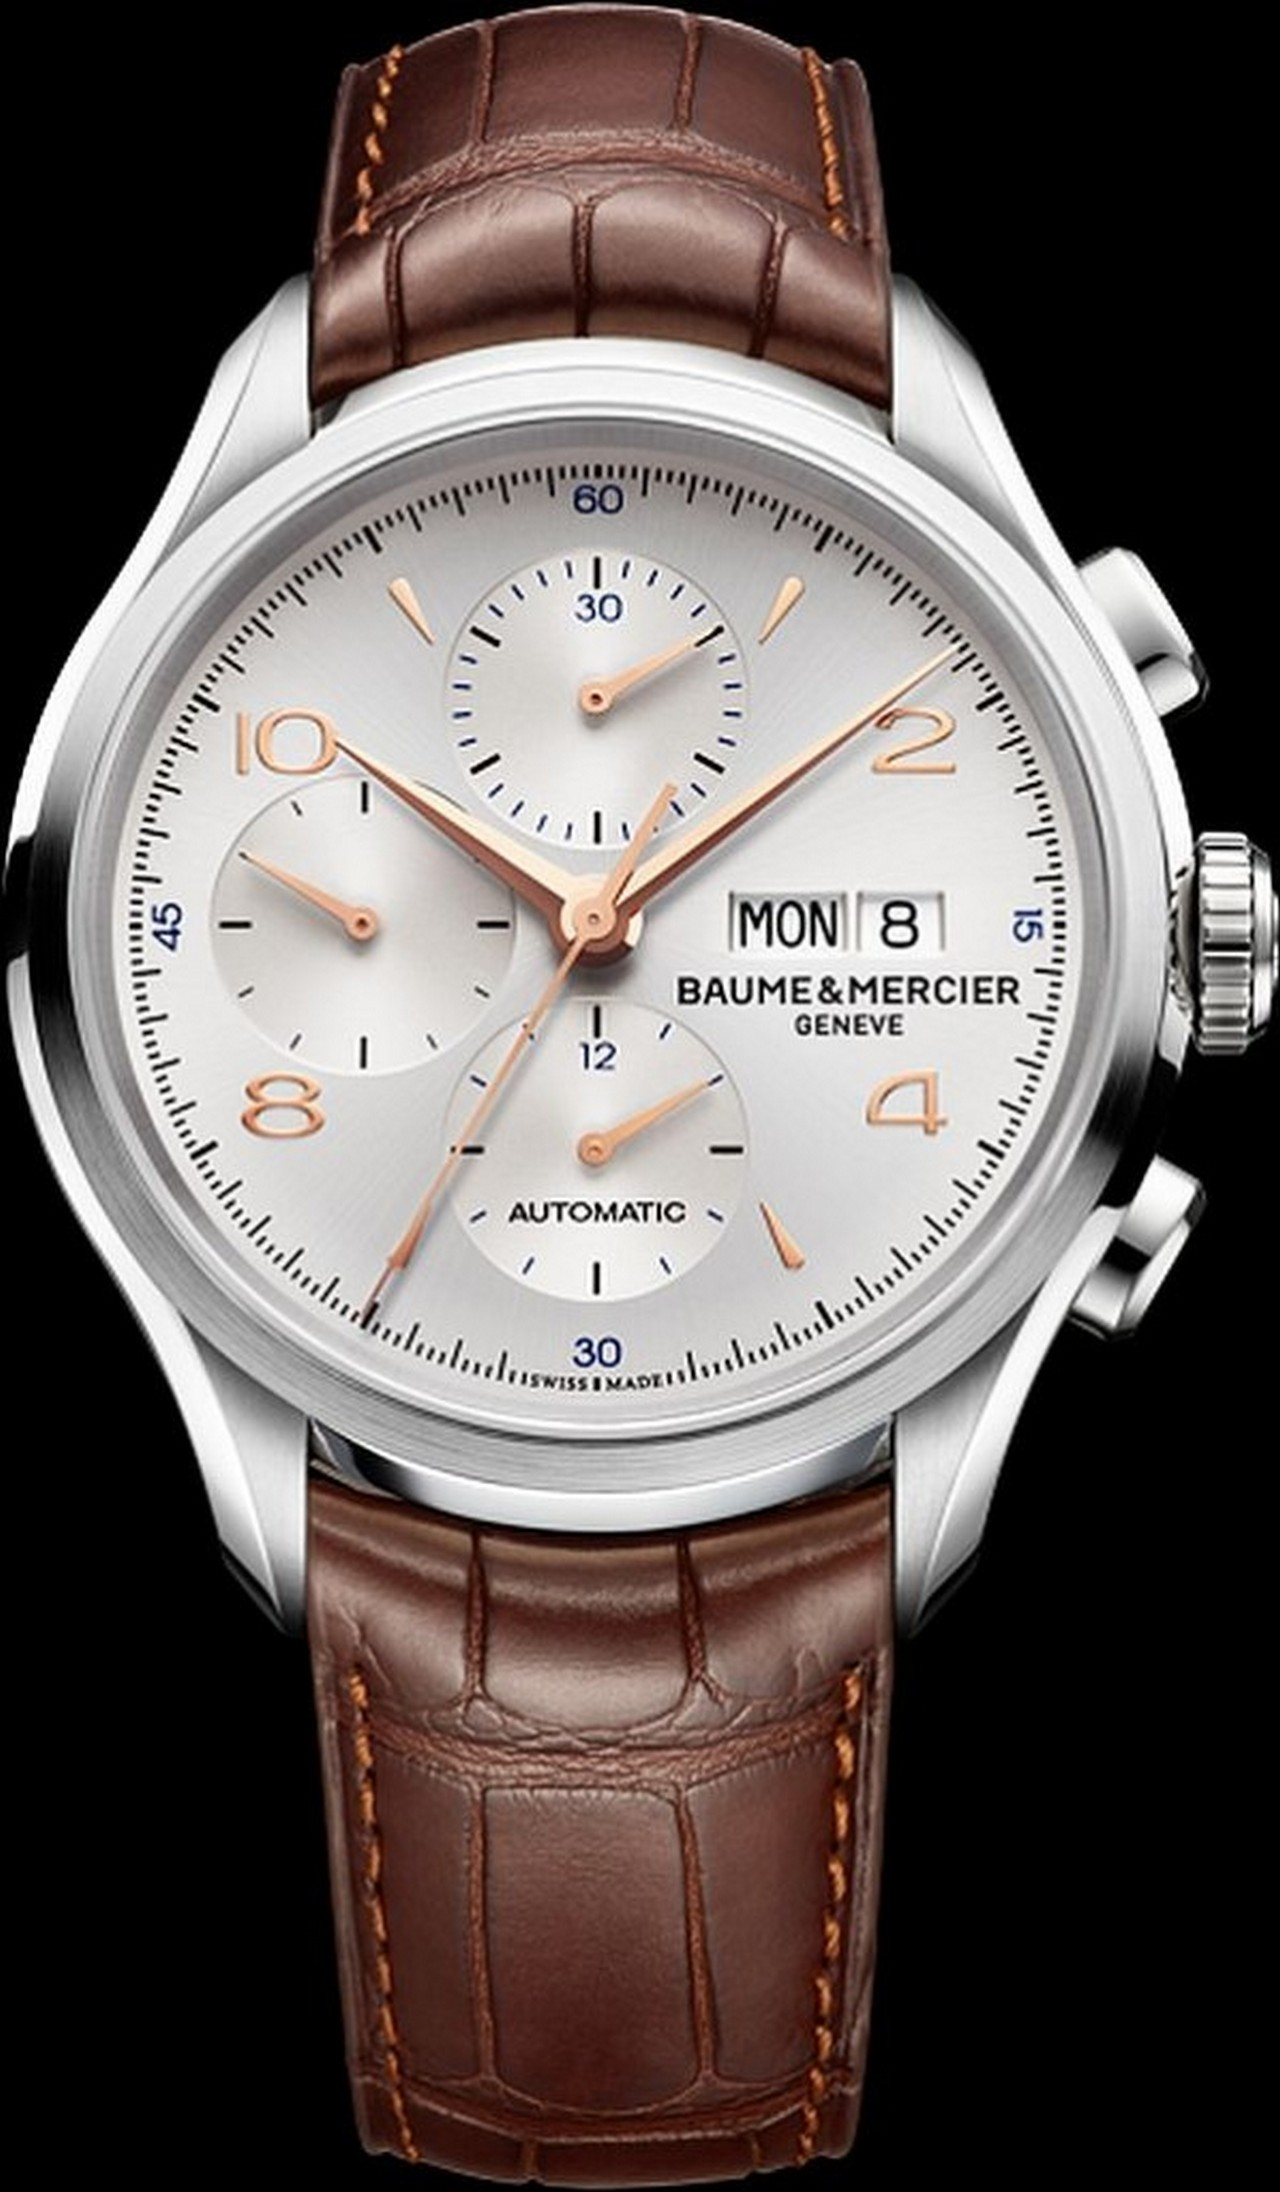 anteprima-sihh-2014-baume-mercier-clifton-chronographs-0-100